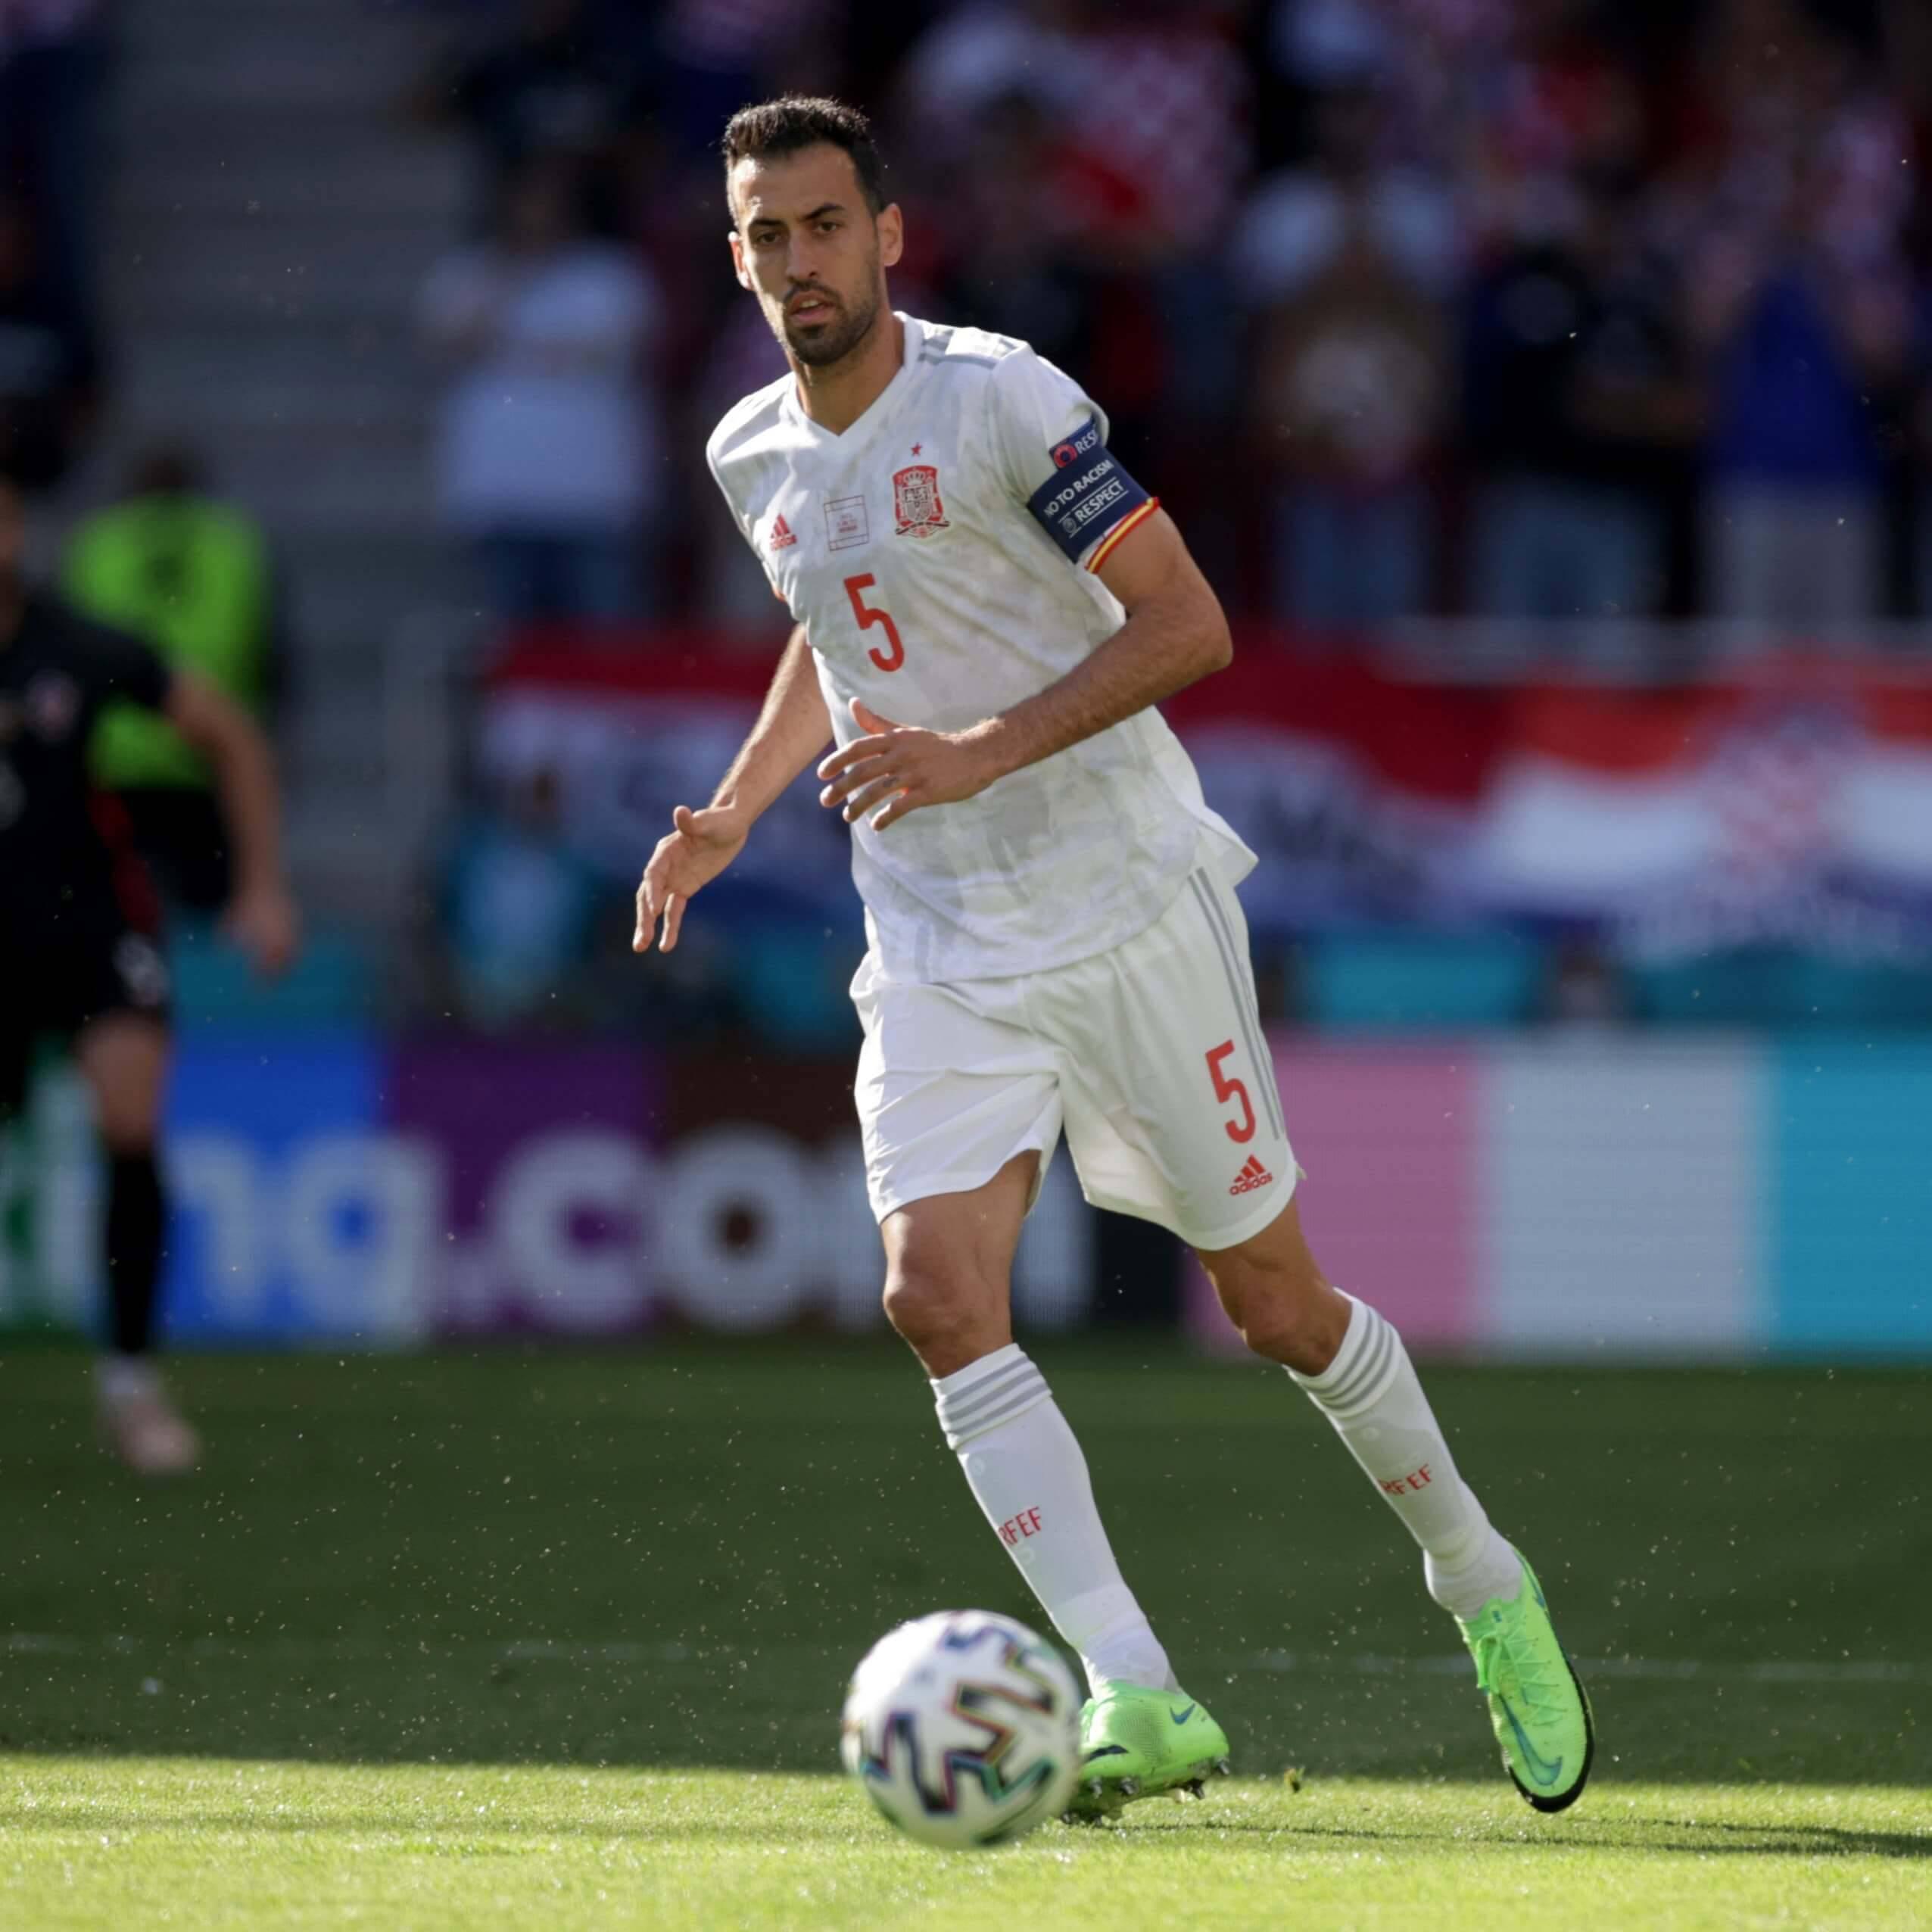 Foto: Reprodução / Twitter Eurocopa